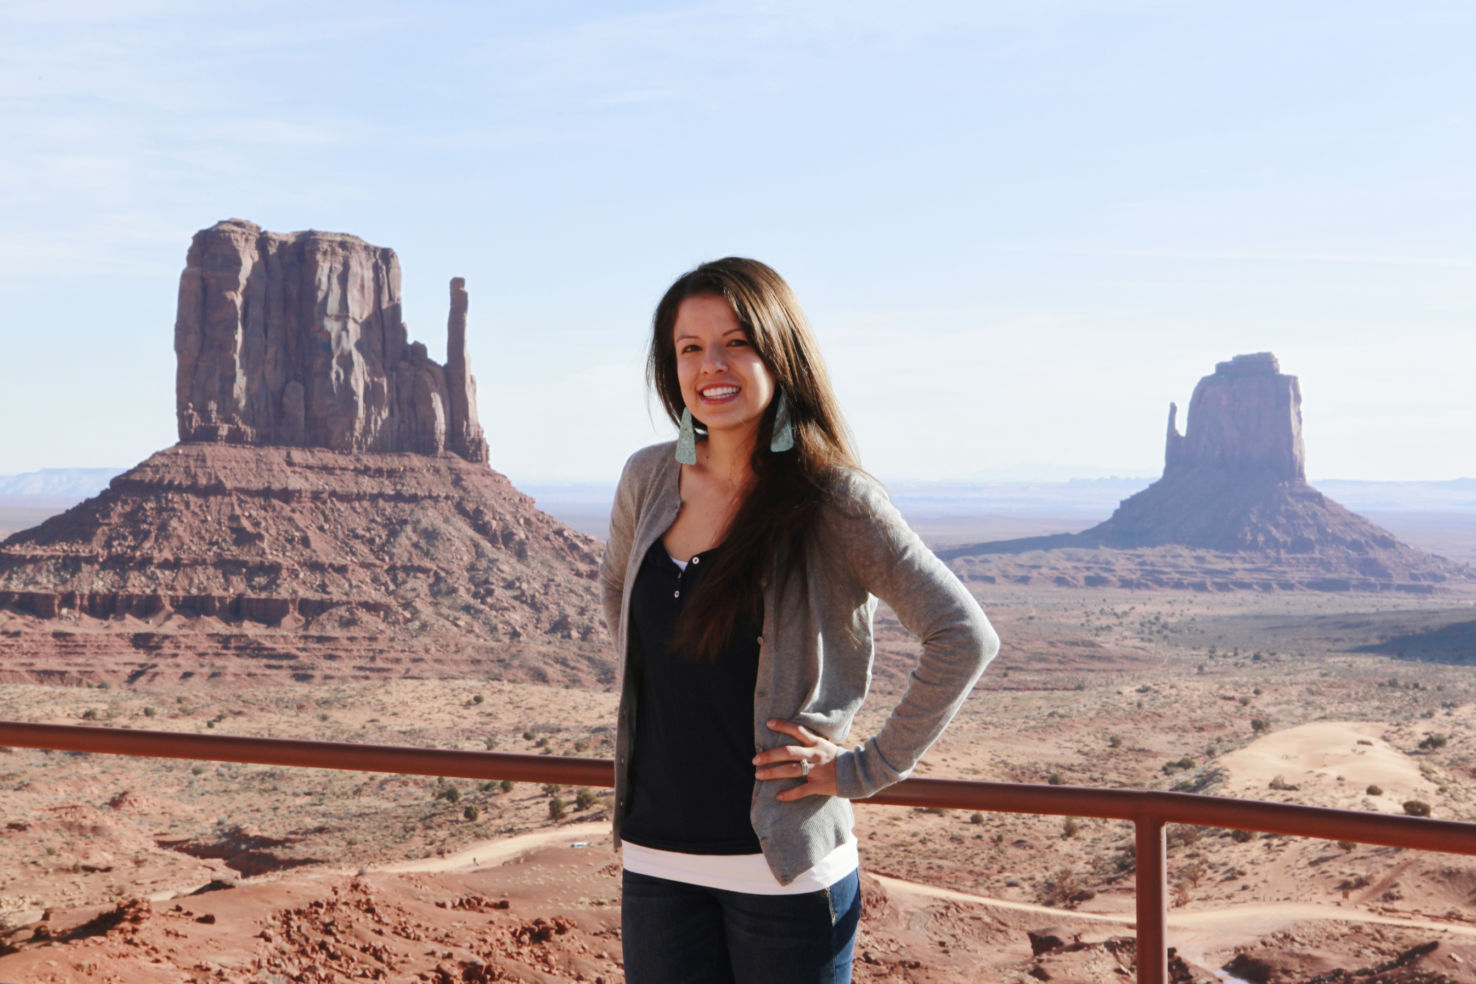 Navajo_Whitney-Tressel_Amanda-Ortega_MG_6062